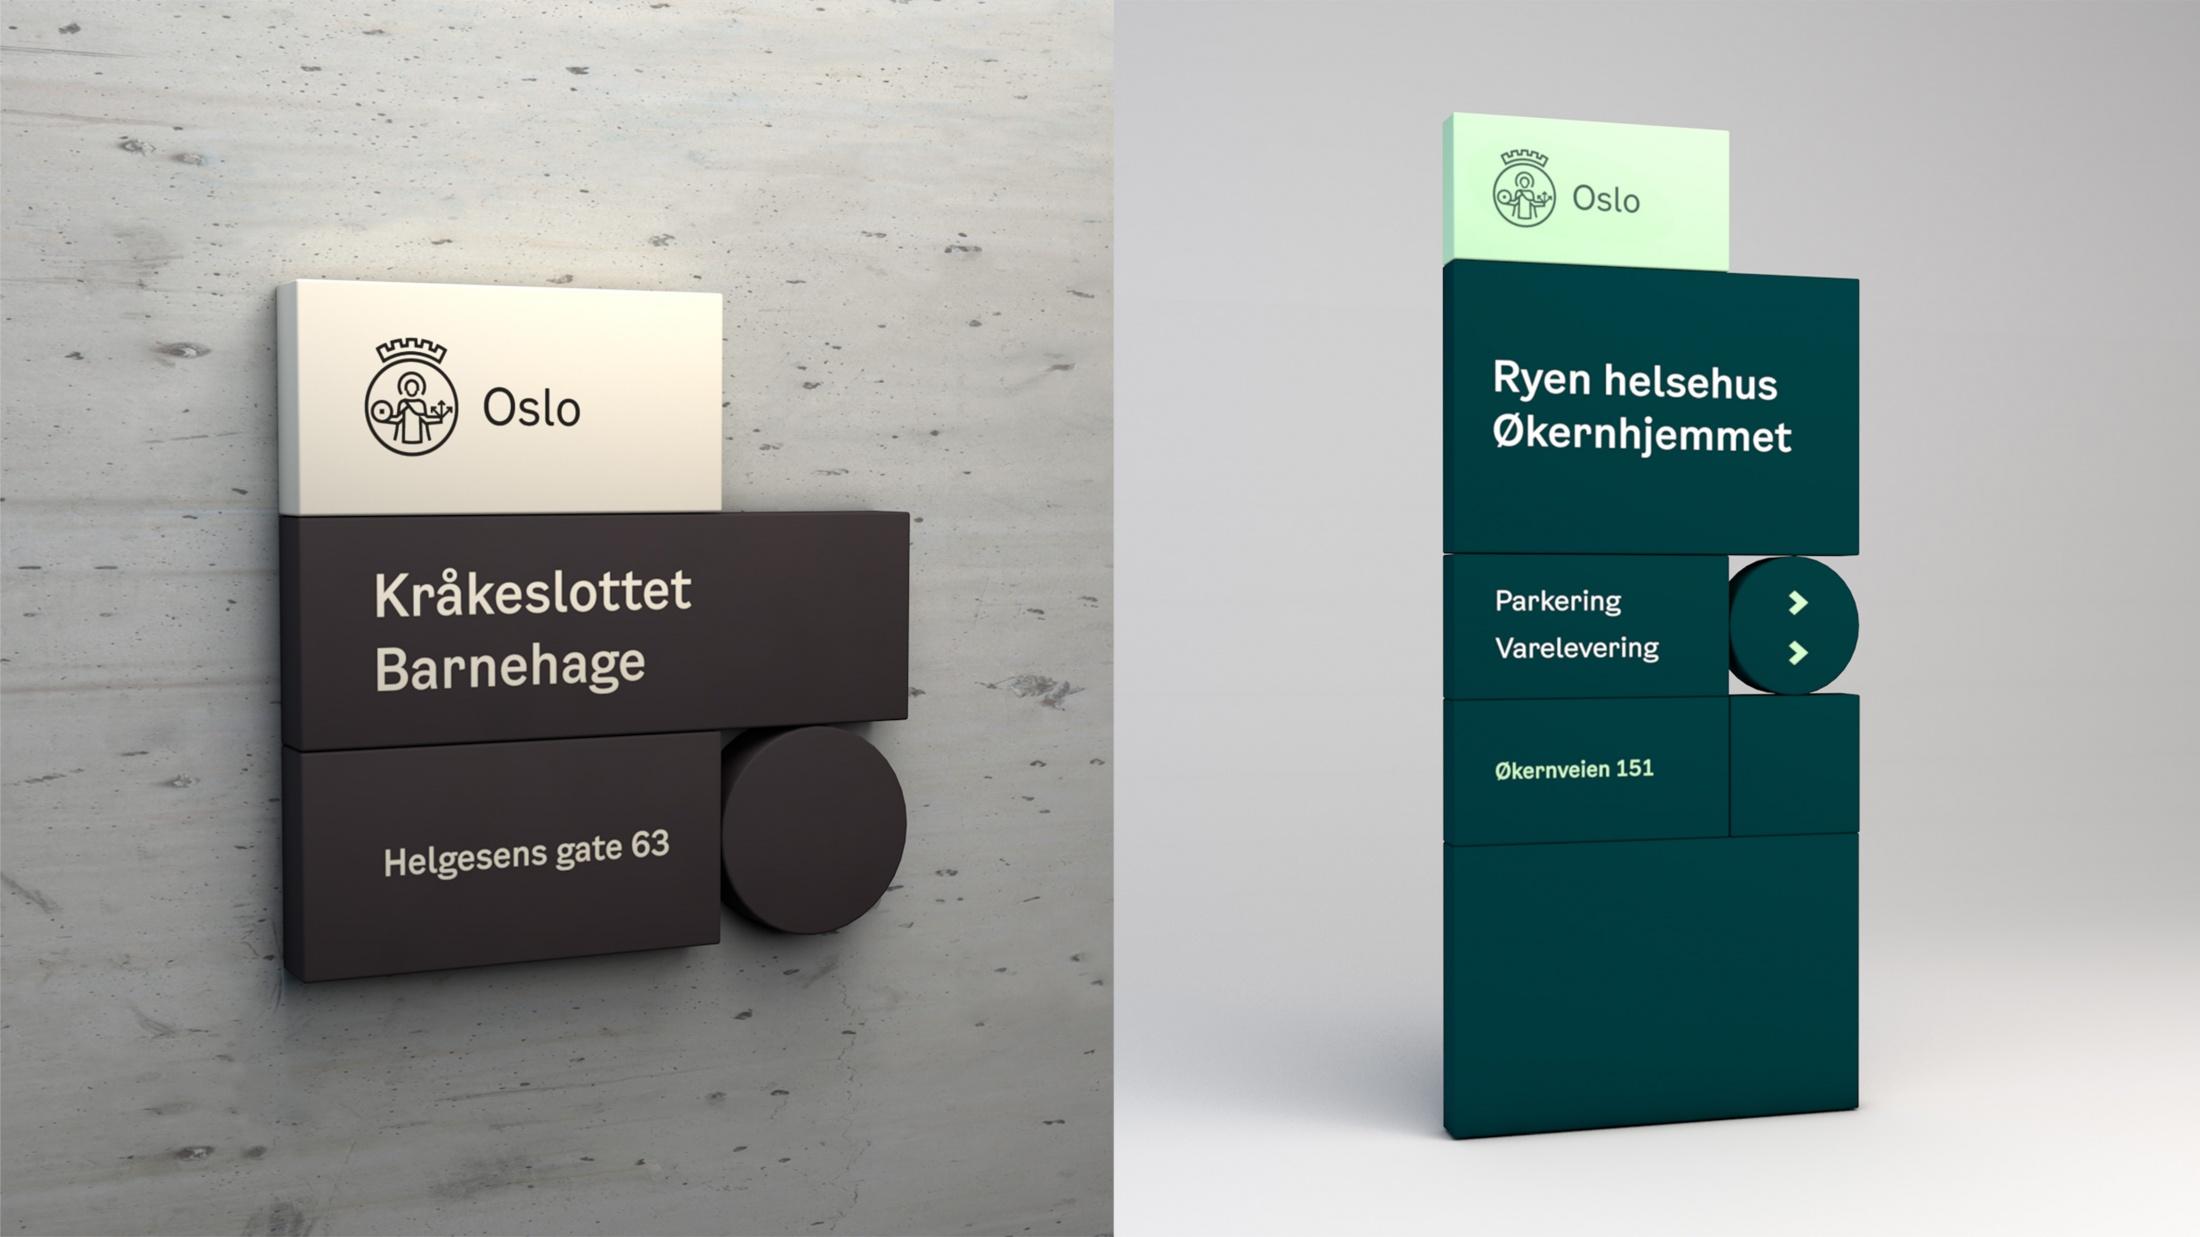 Thumbnail for An Identity that Unites Oslo